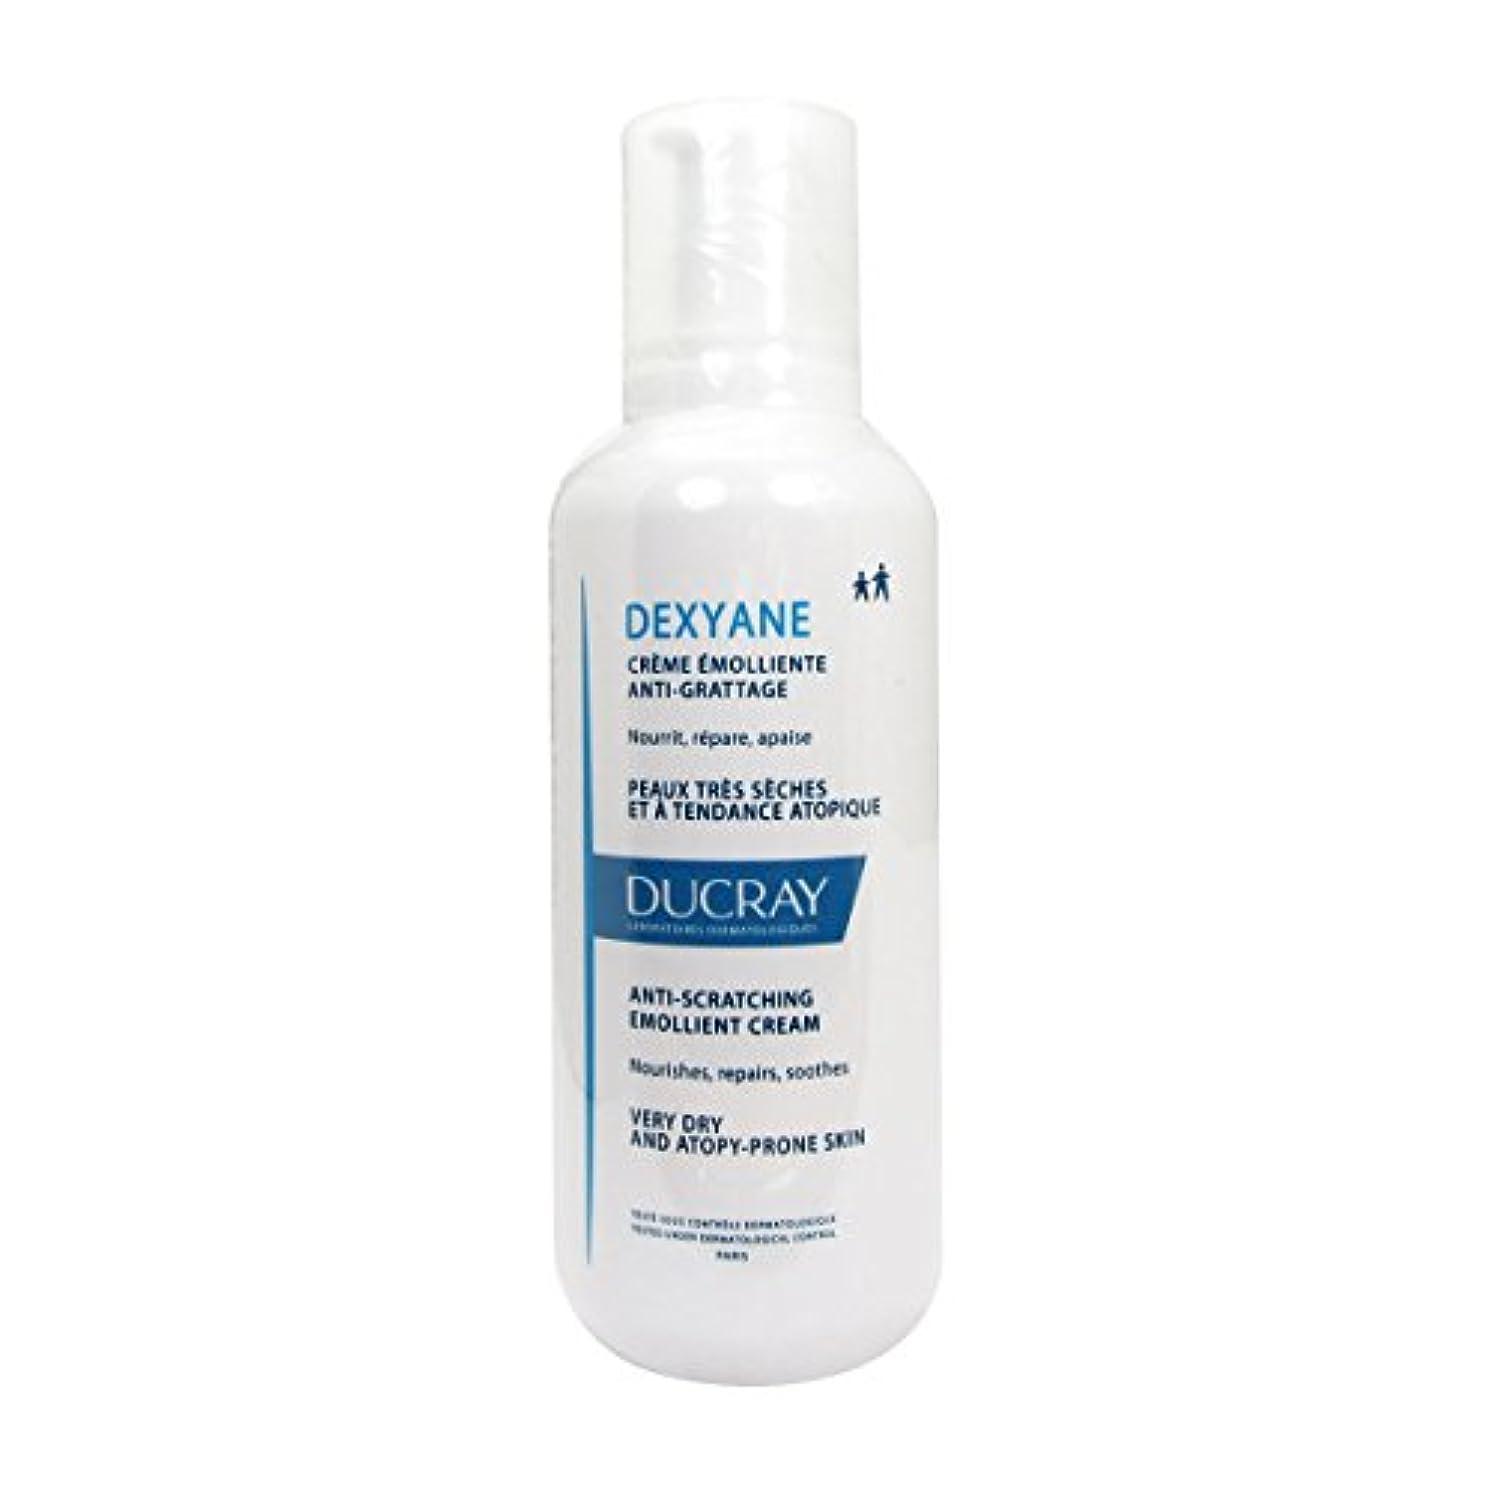 アトム猟犬成熟Ducray Dexyane Anti-scratching Emollient Cream 400ml [並行輸入品]